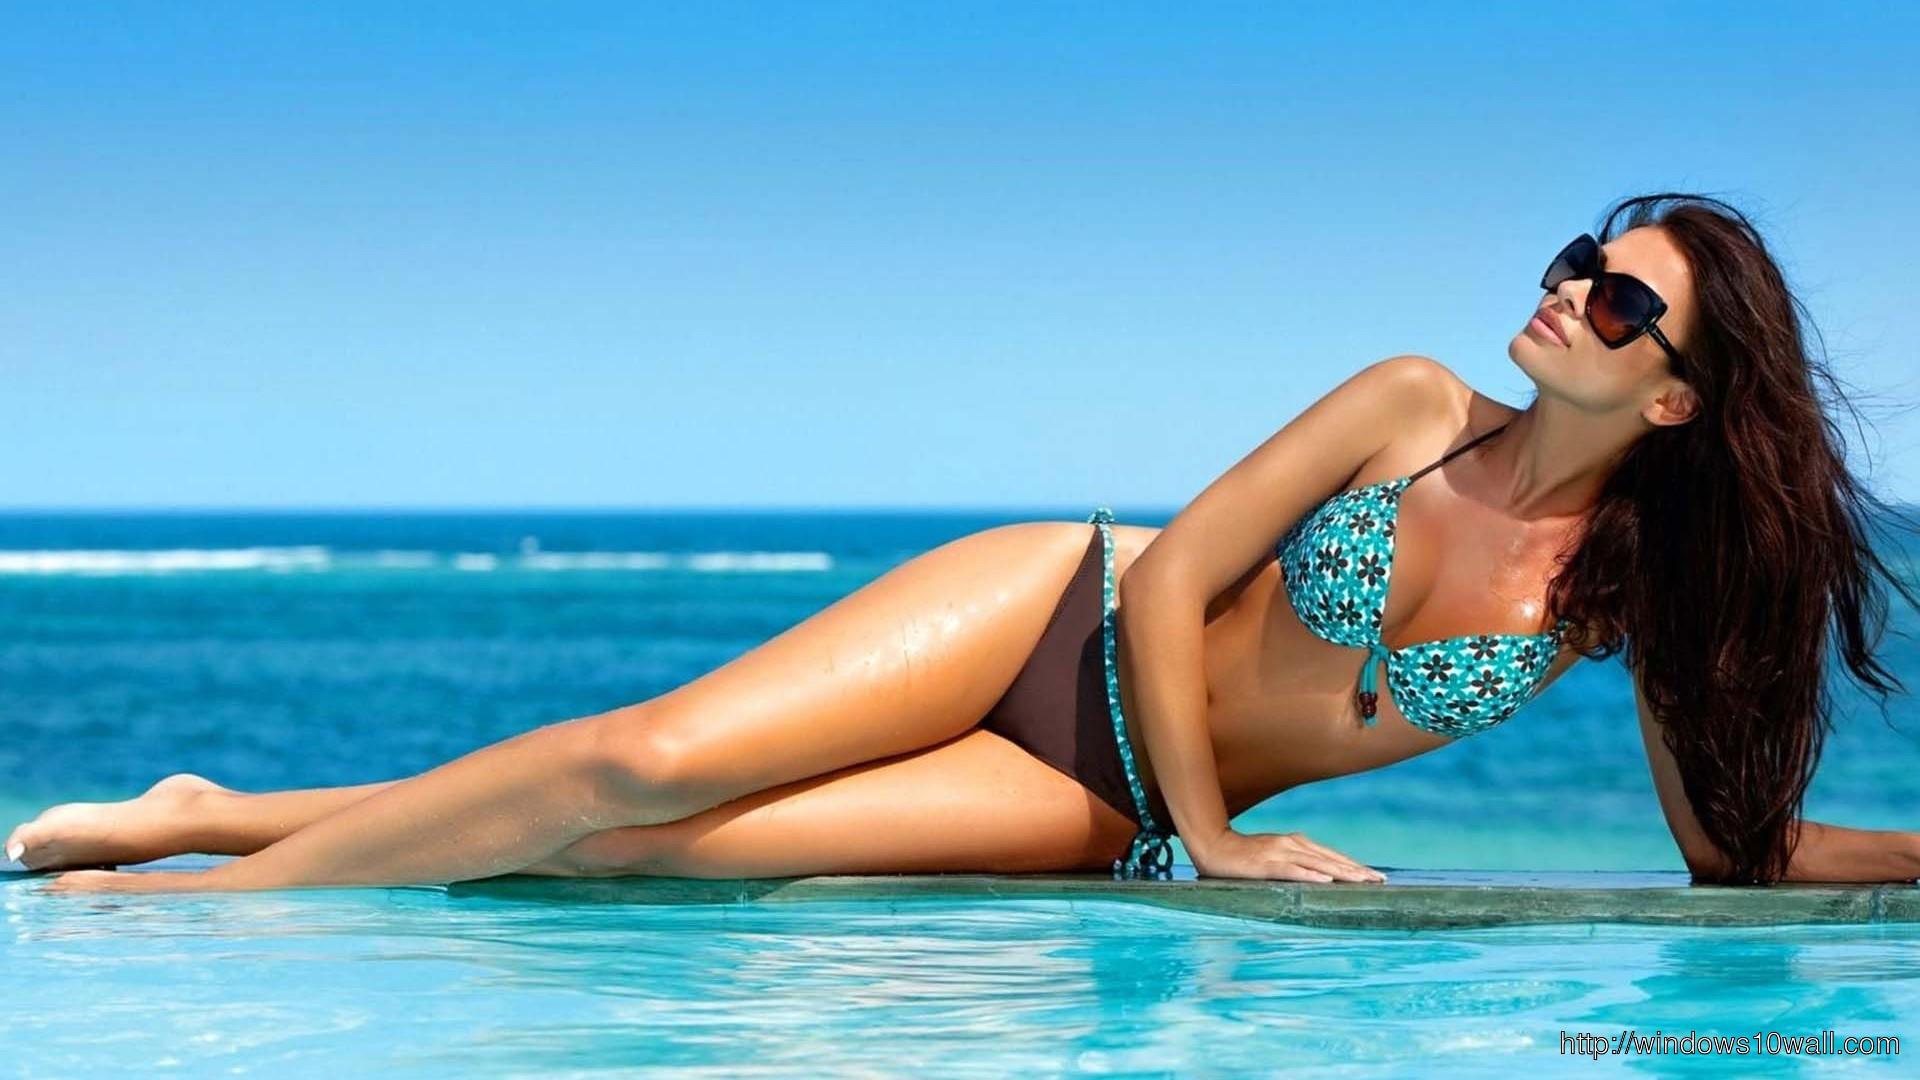 beautiful swimwear desktop you will love to put on your screen